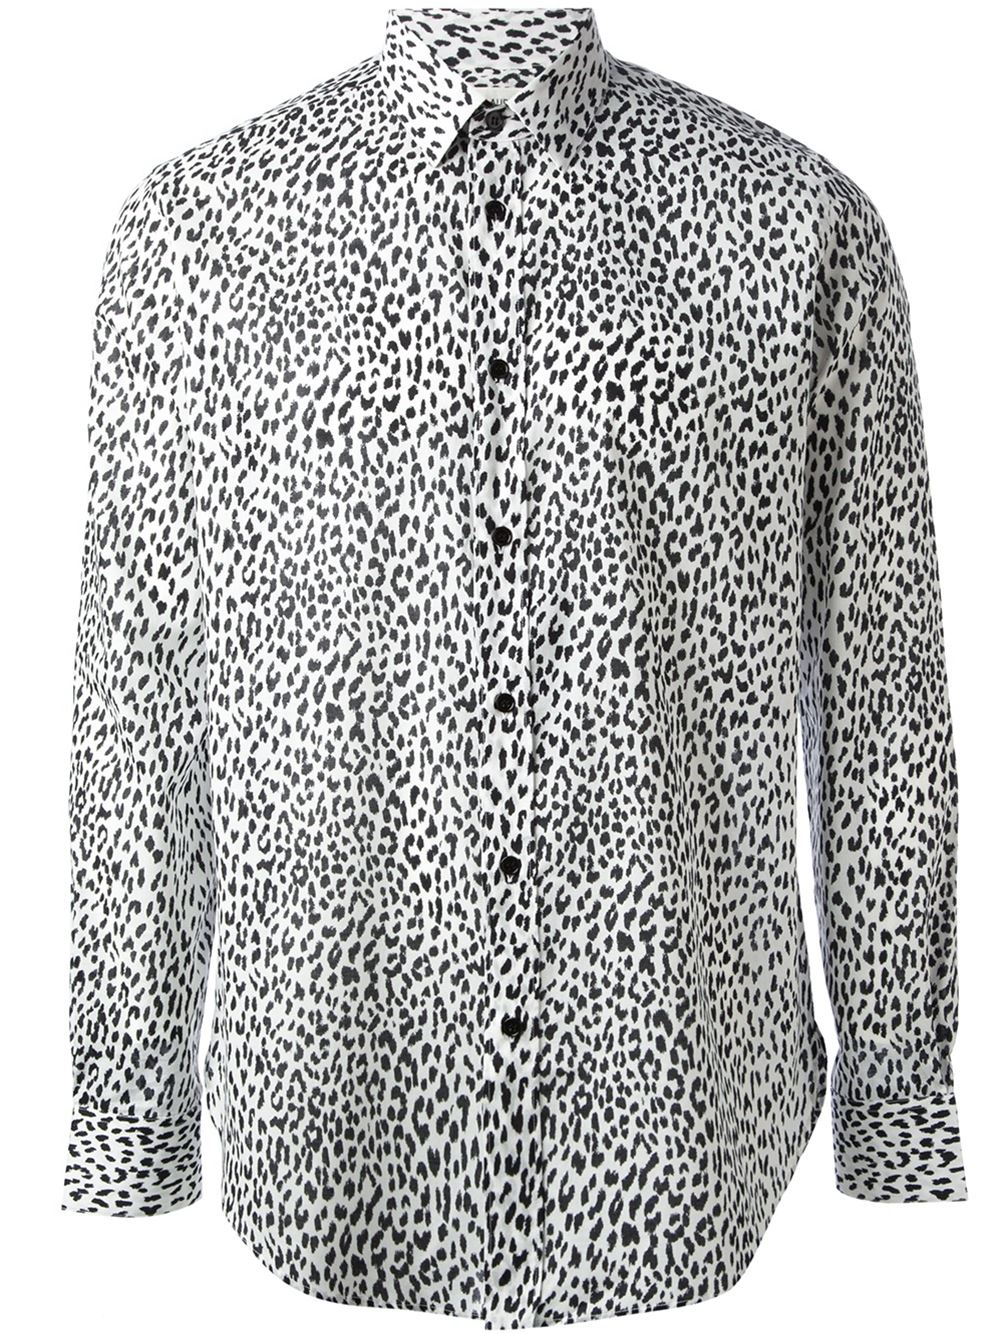 08a9b04e2f Saint Laurent Leopard Print Shirt in Black for Men - Lyst